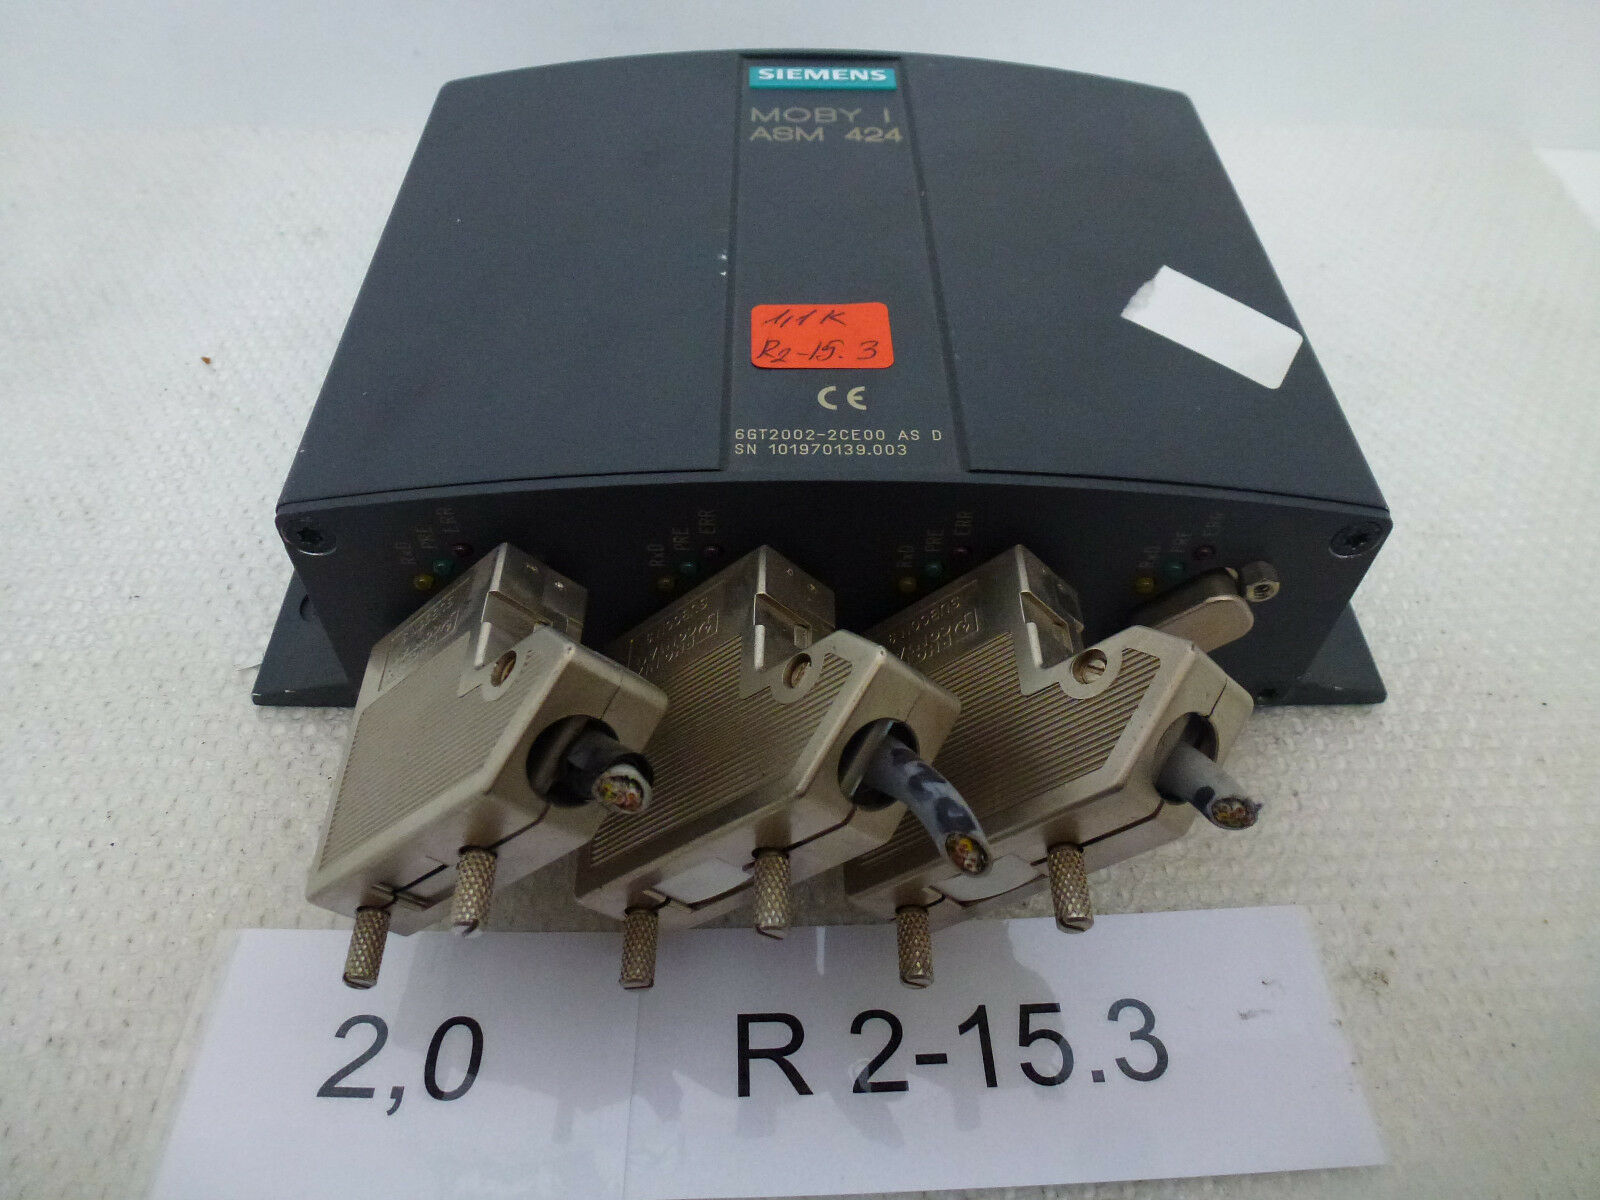 Siemens 6GT2002-2CE00, Moby I Asm 424